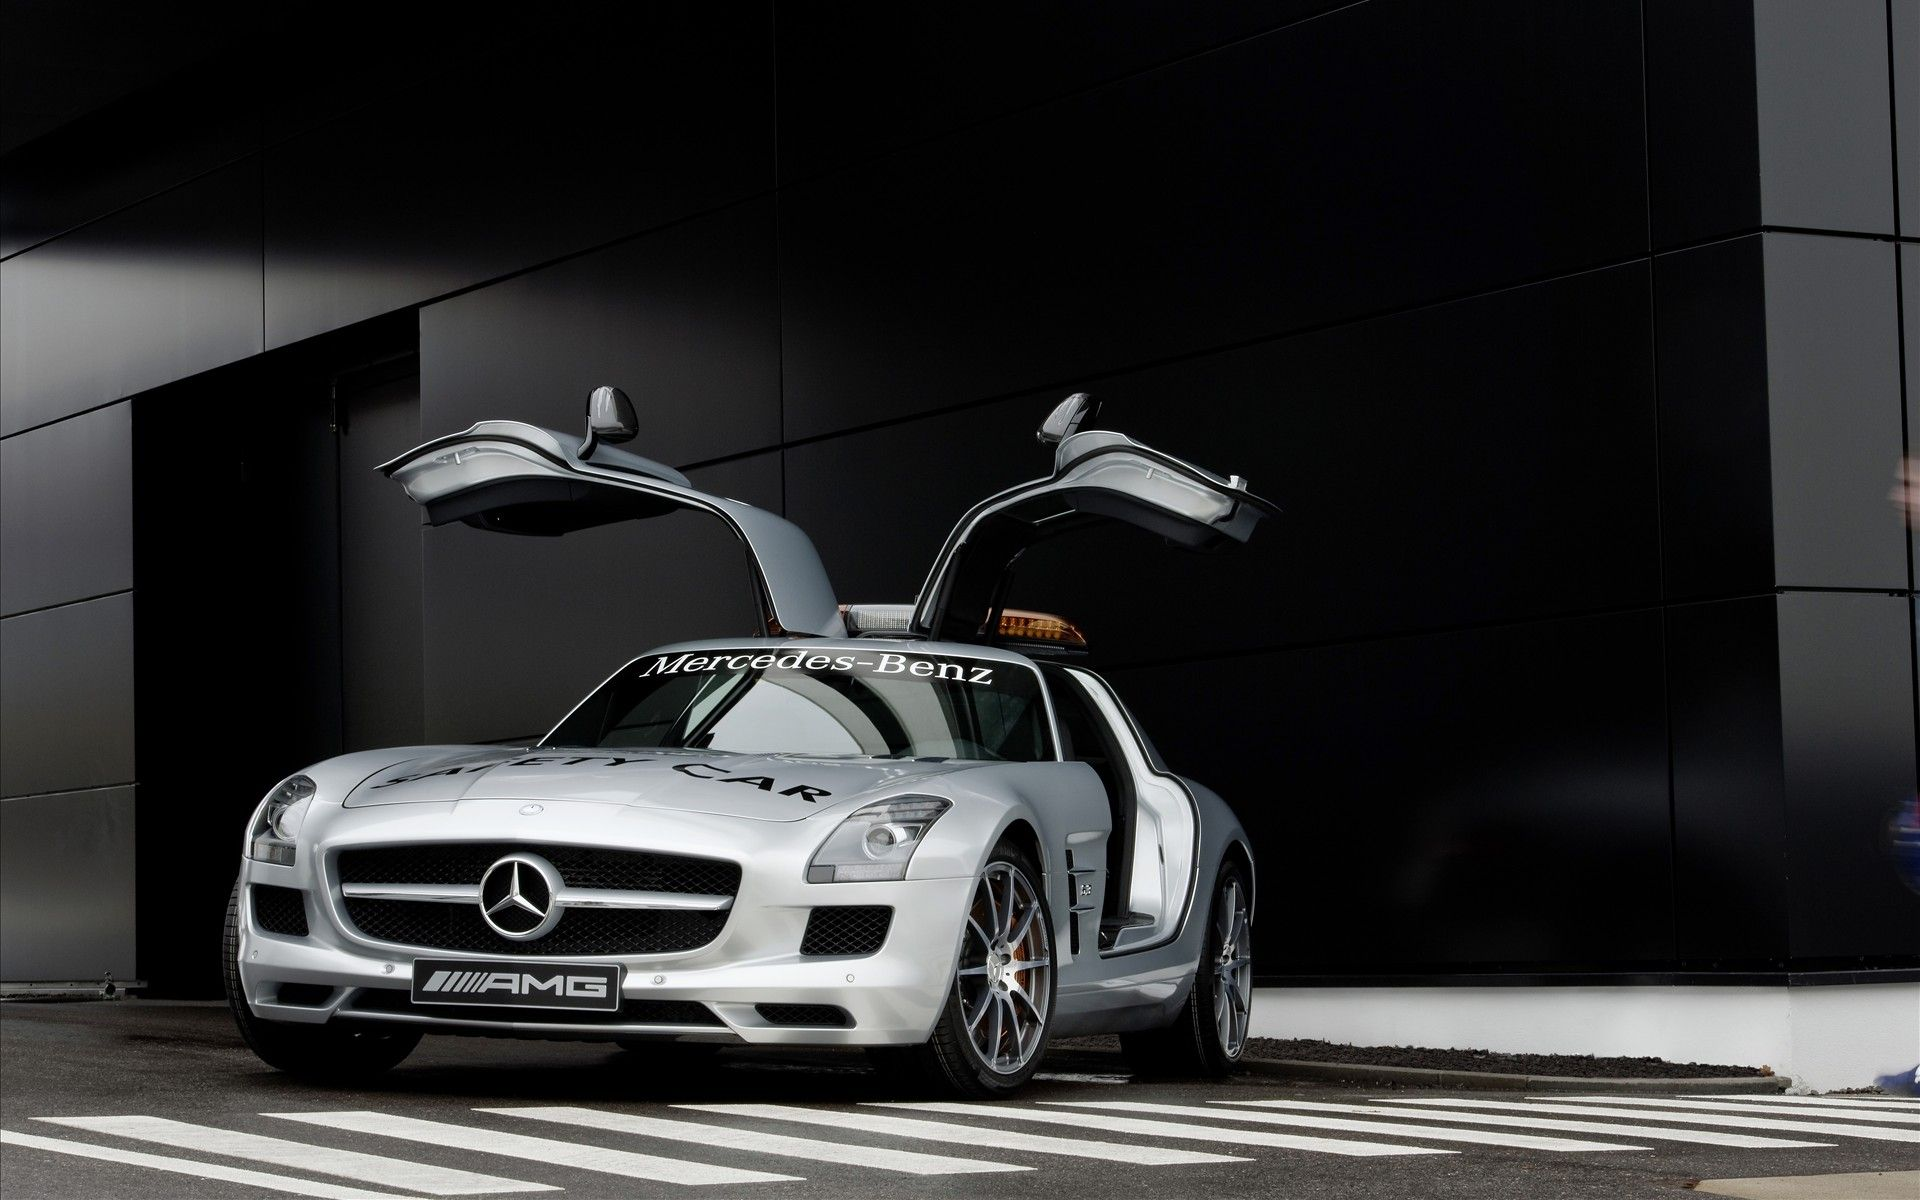 Mercedez Benz F1 Safety Car Mercedes car, Mercedes sls